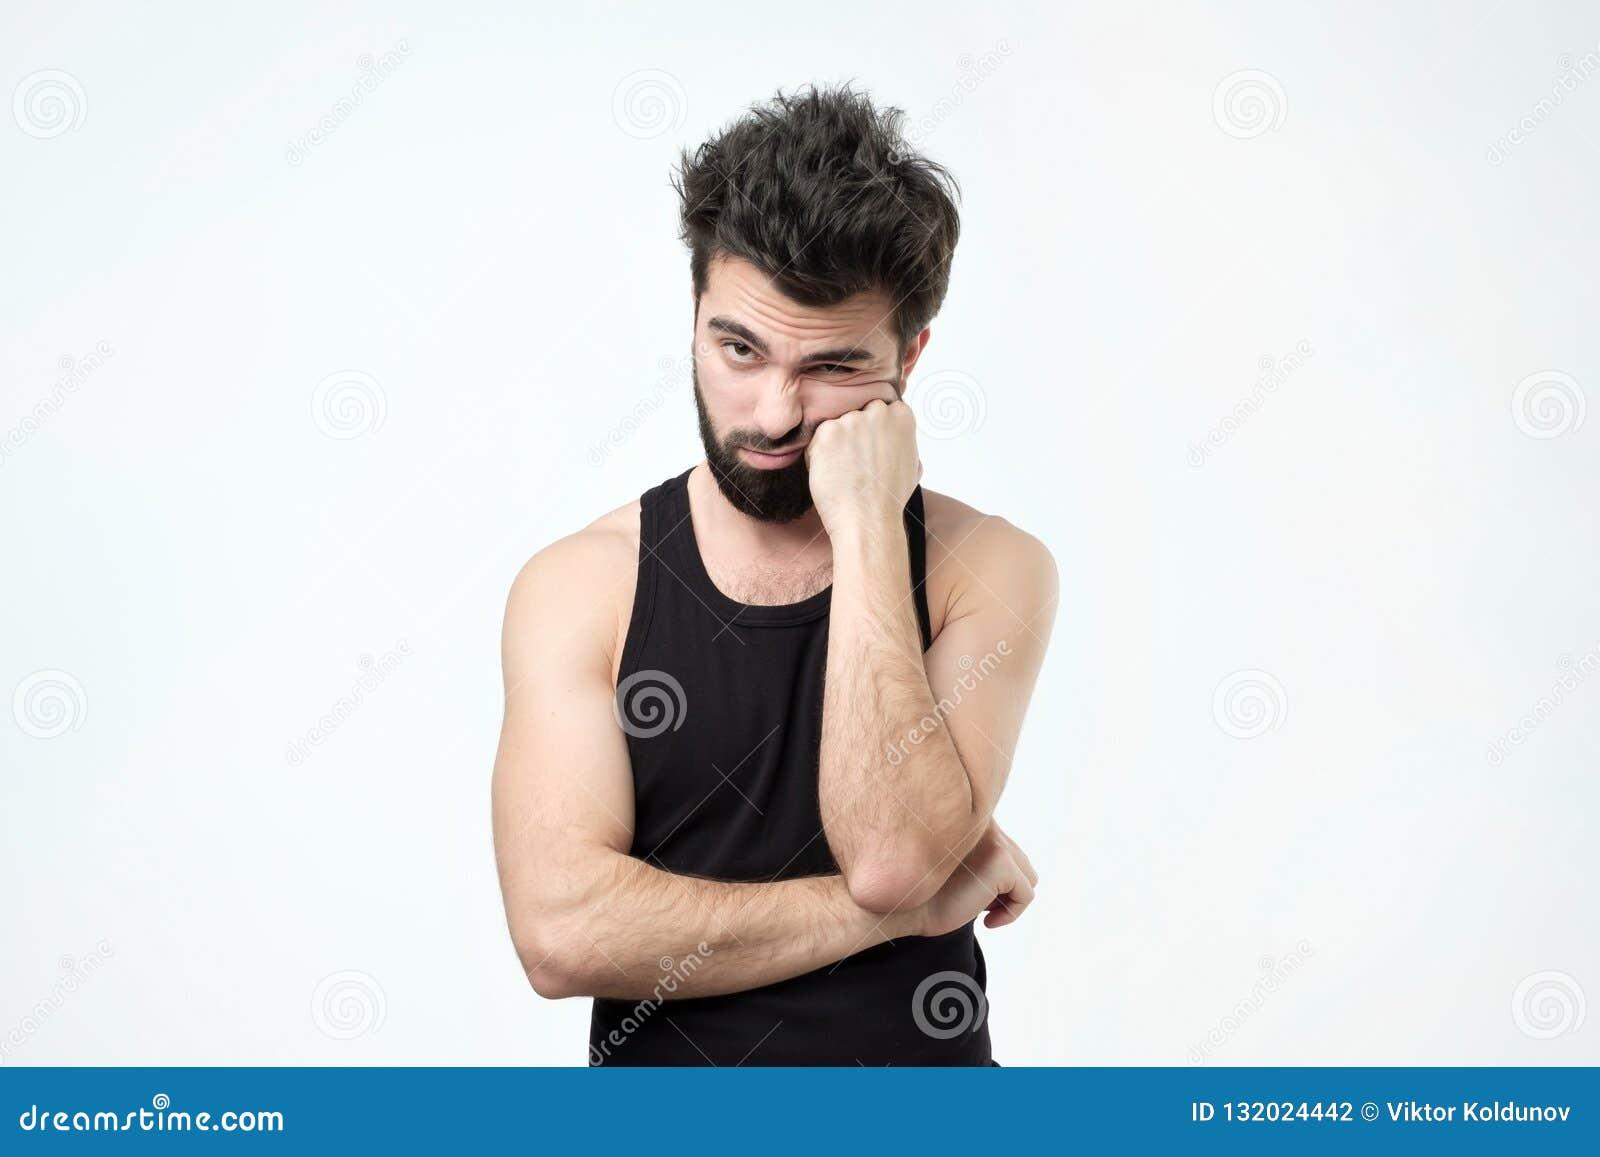 Indivíduo latino-americano cansado com barba, sendo esgotado e querendo obter o resto contra o fundo cinzento